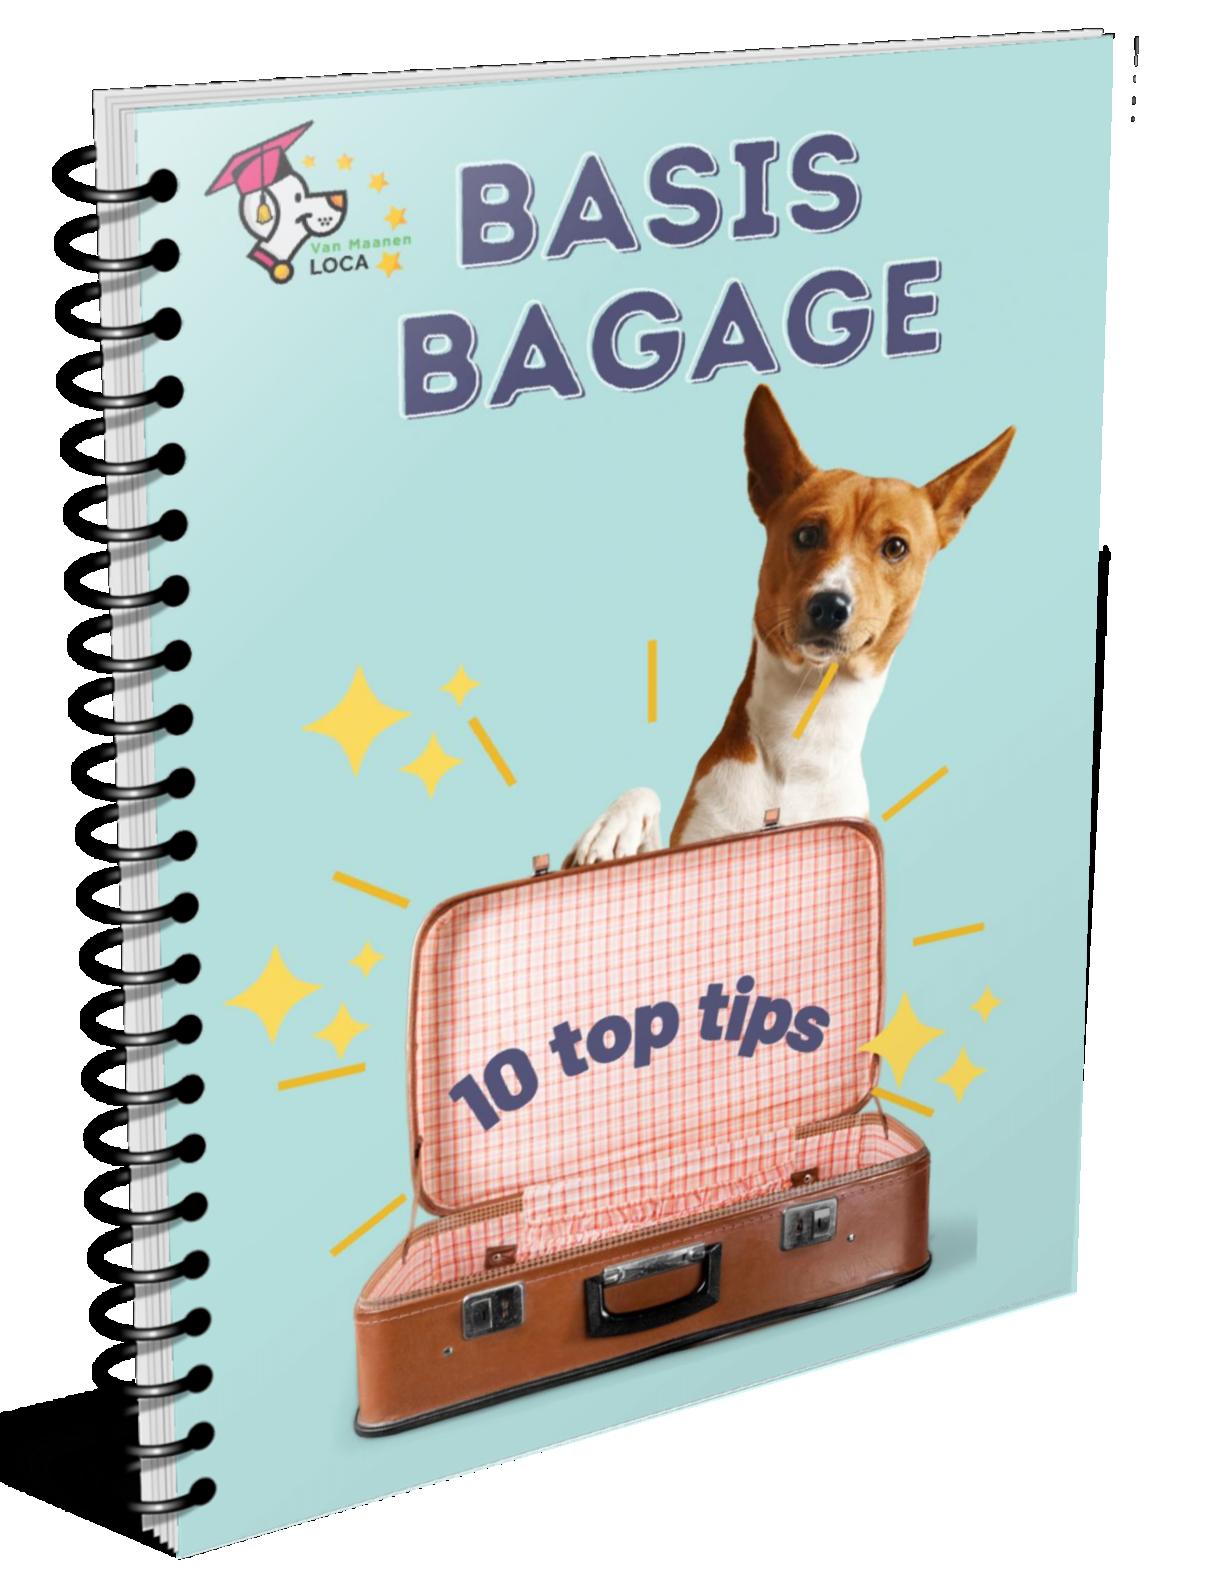 basis bagage online honden cursus